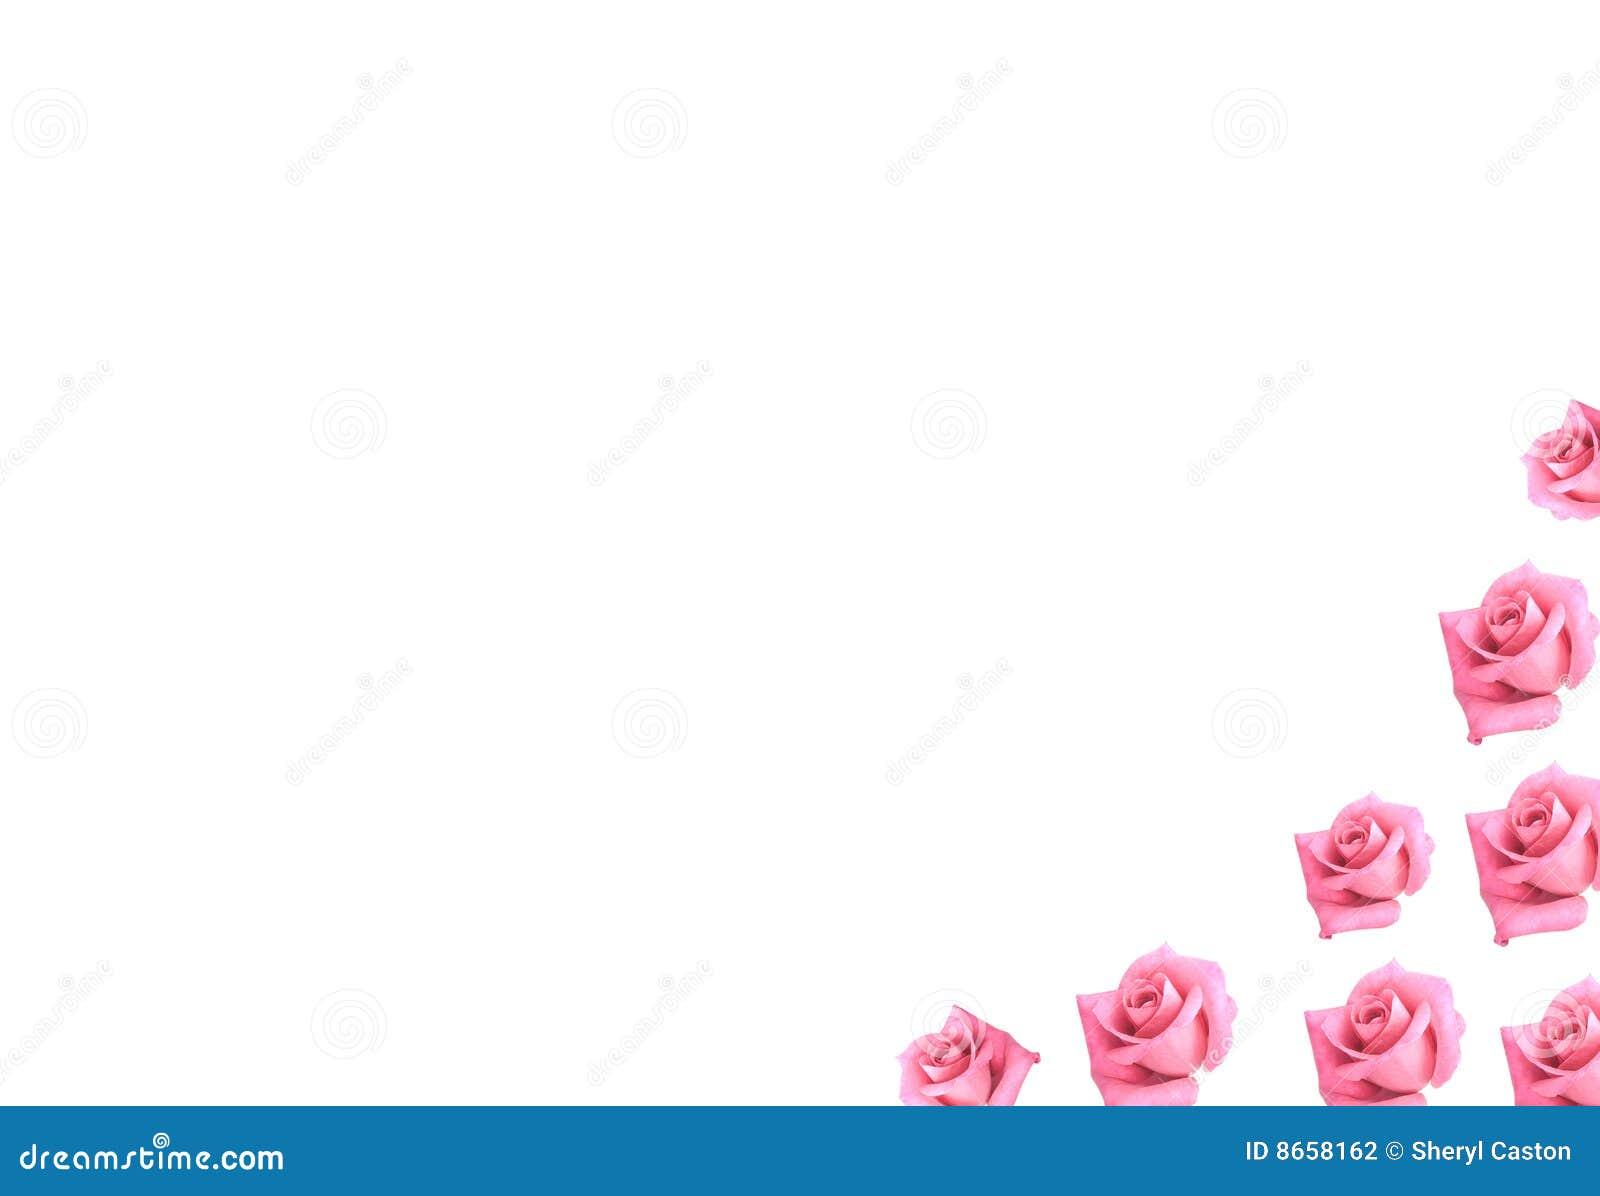 Le cadre de fond fleurit les roses roses scrapbooking